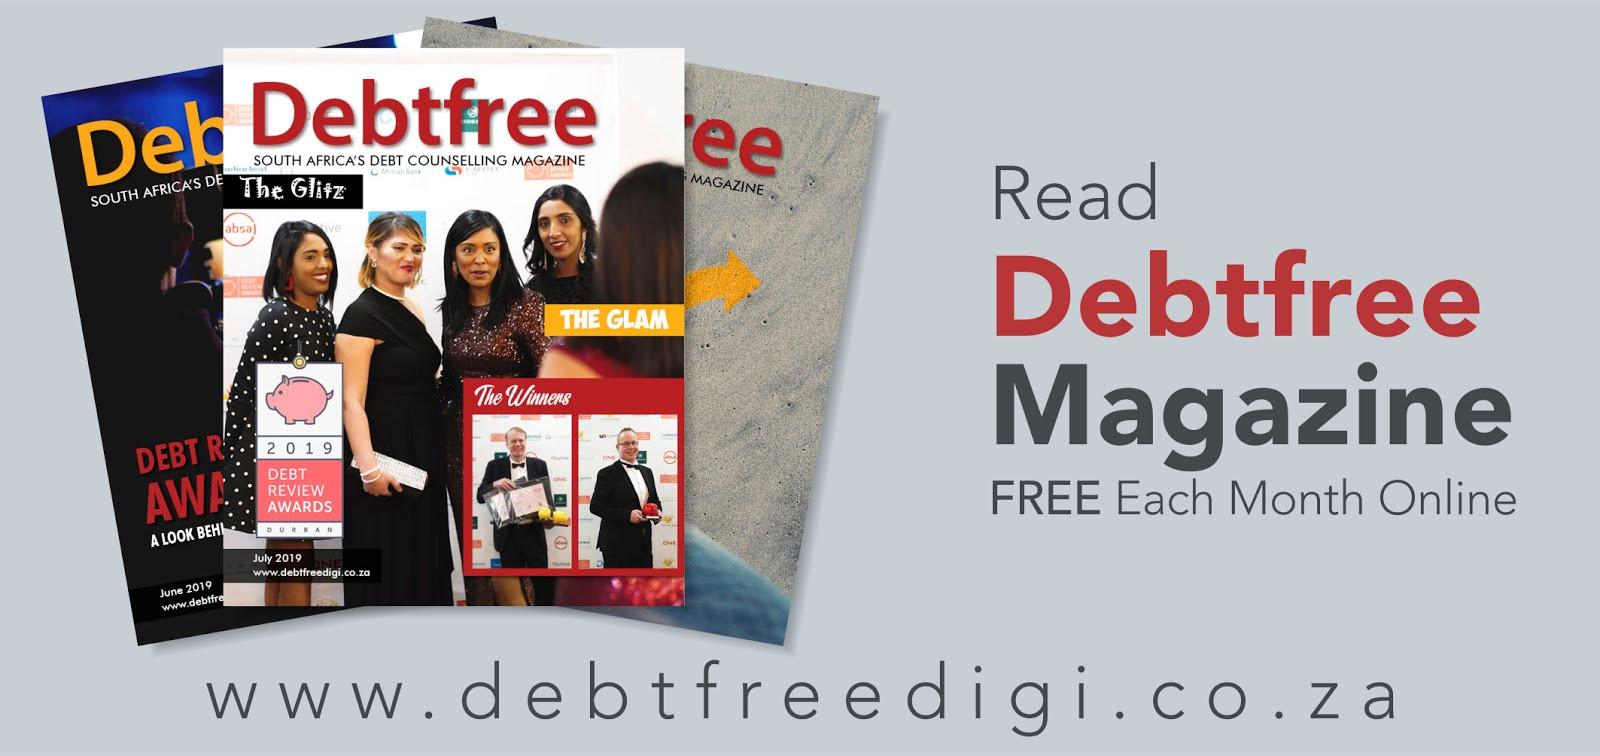 Debtfree DIGI